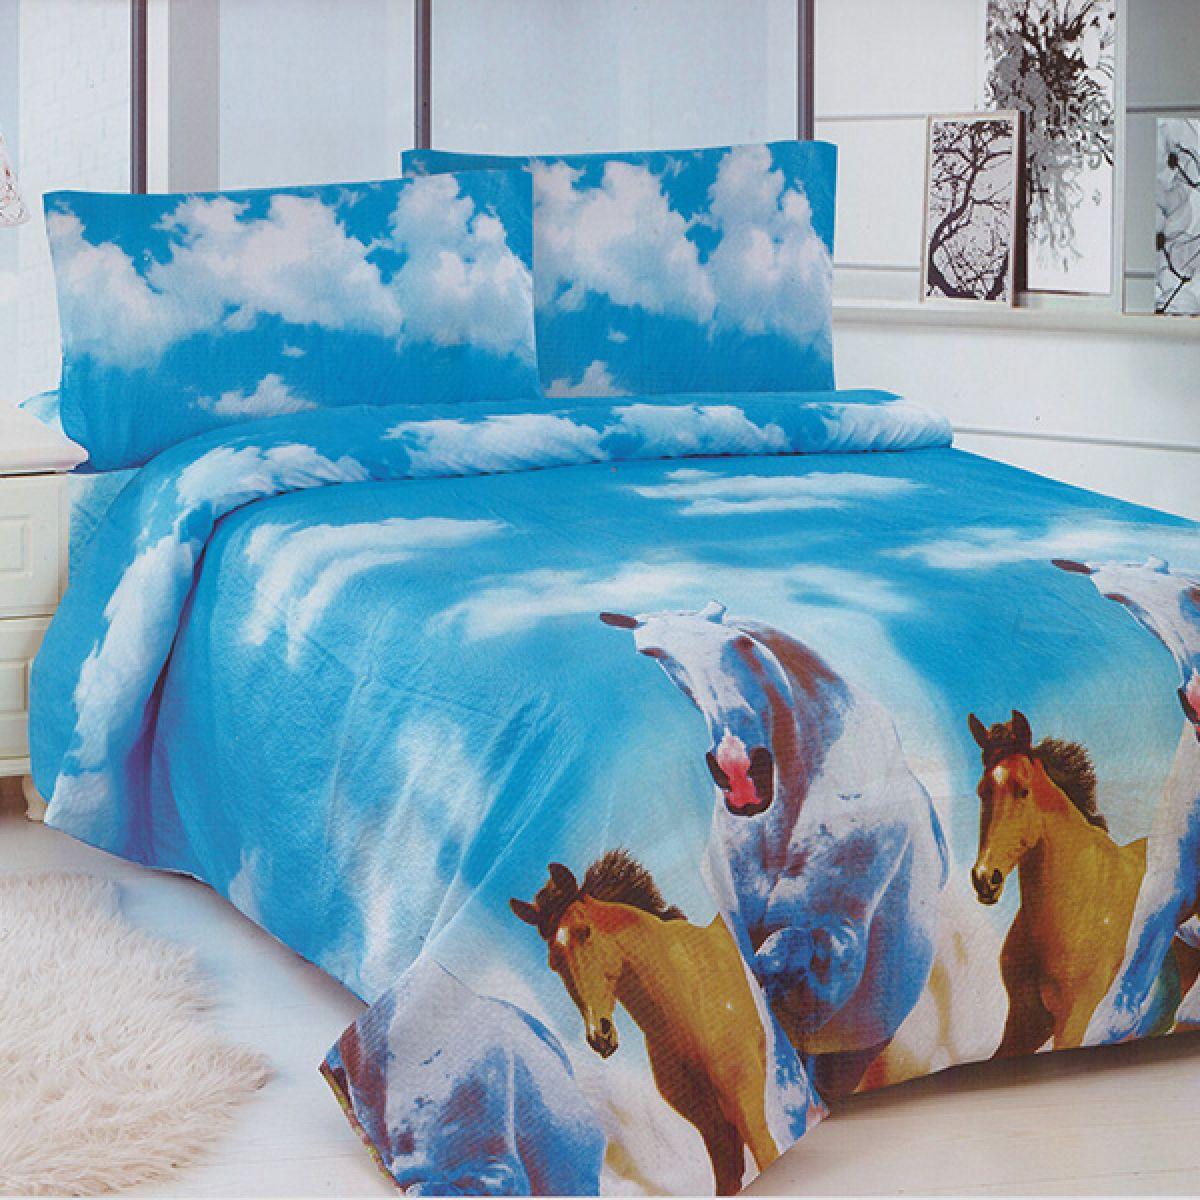 Cheap Beddings - TPR-YP-360 - 220x200cm - 4 pcs